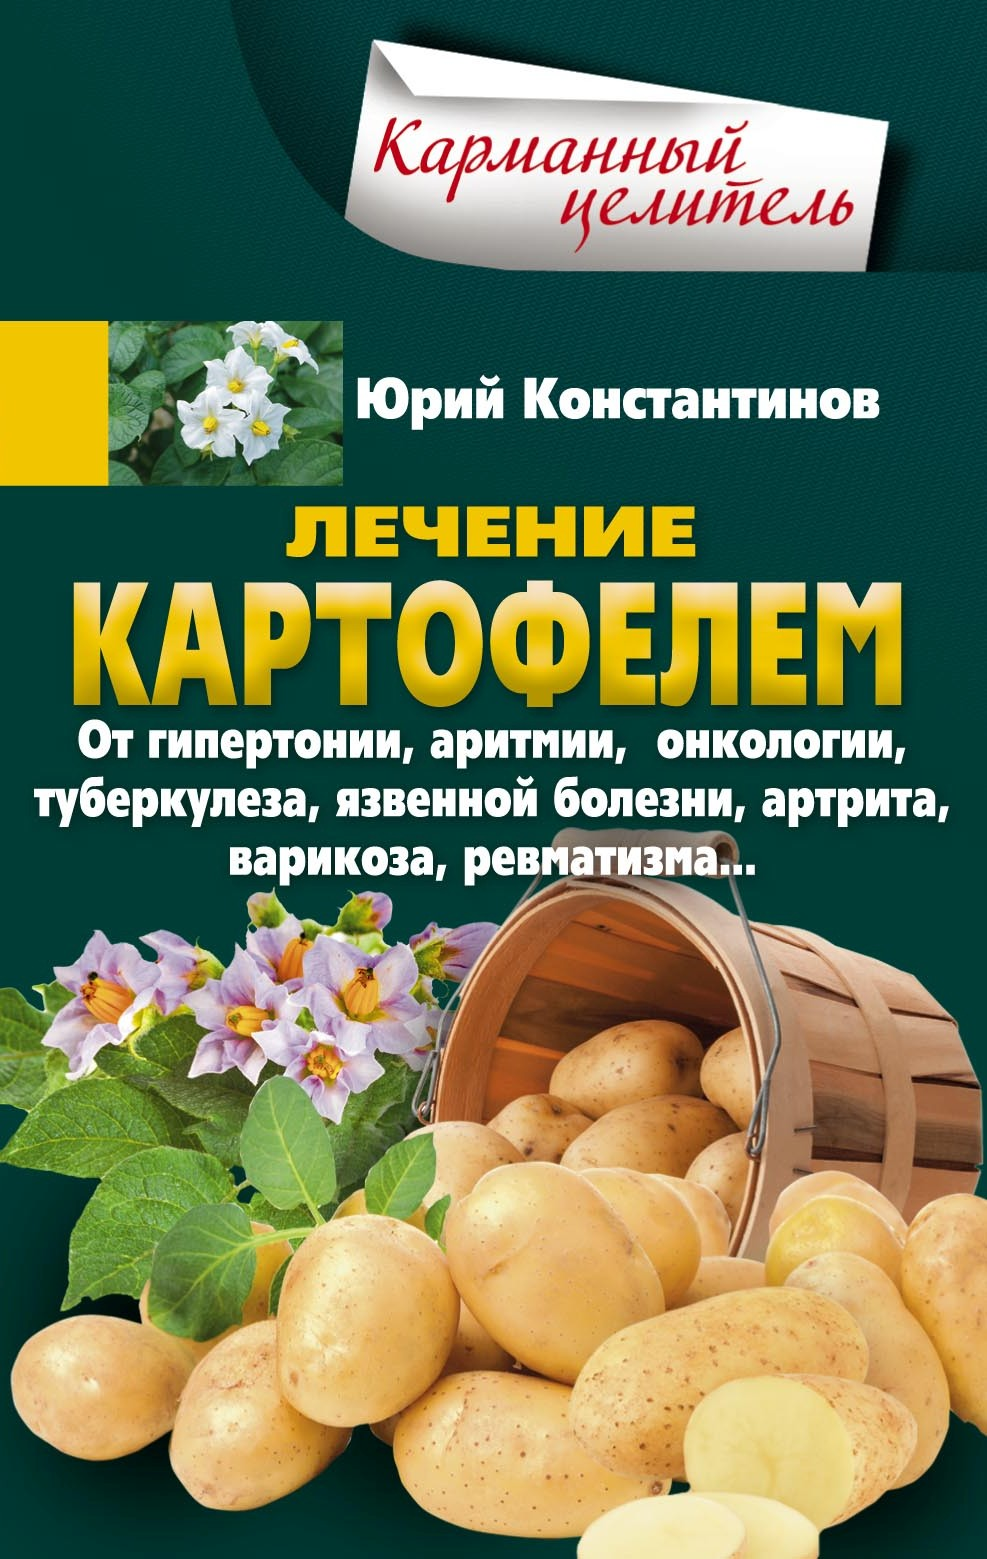 Лечение картофелем от гипертонии, аритмии, онкологии, туберкулеза, язвенной болезни, артрита, варикоза, ревматизма…